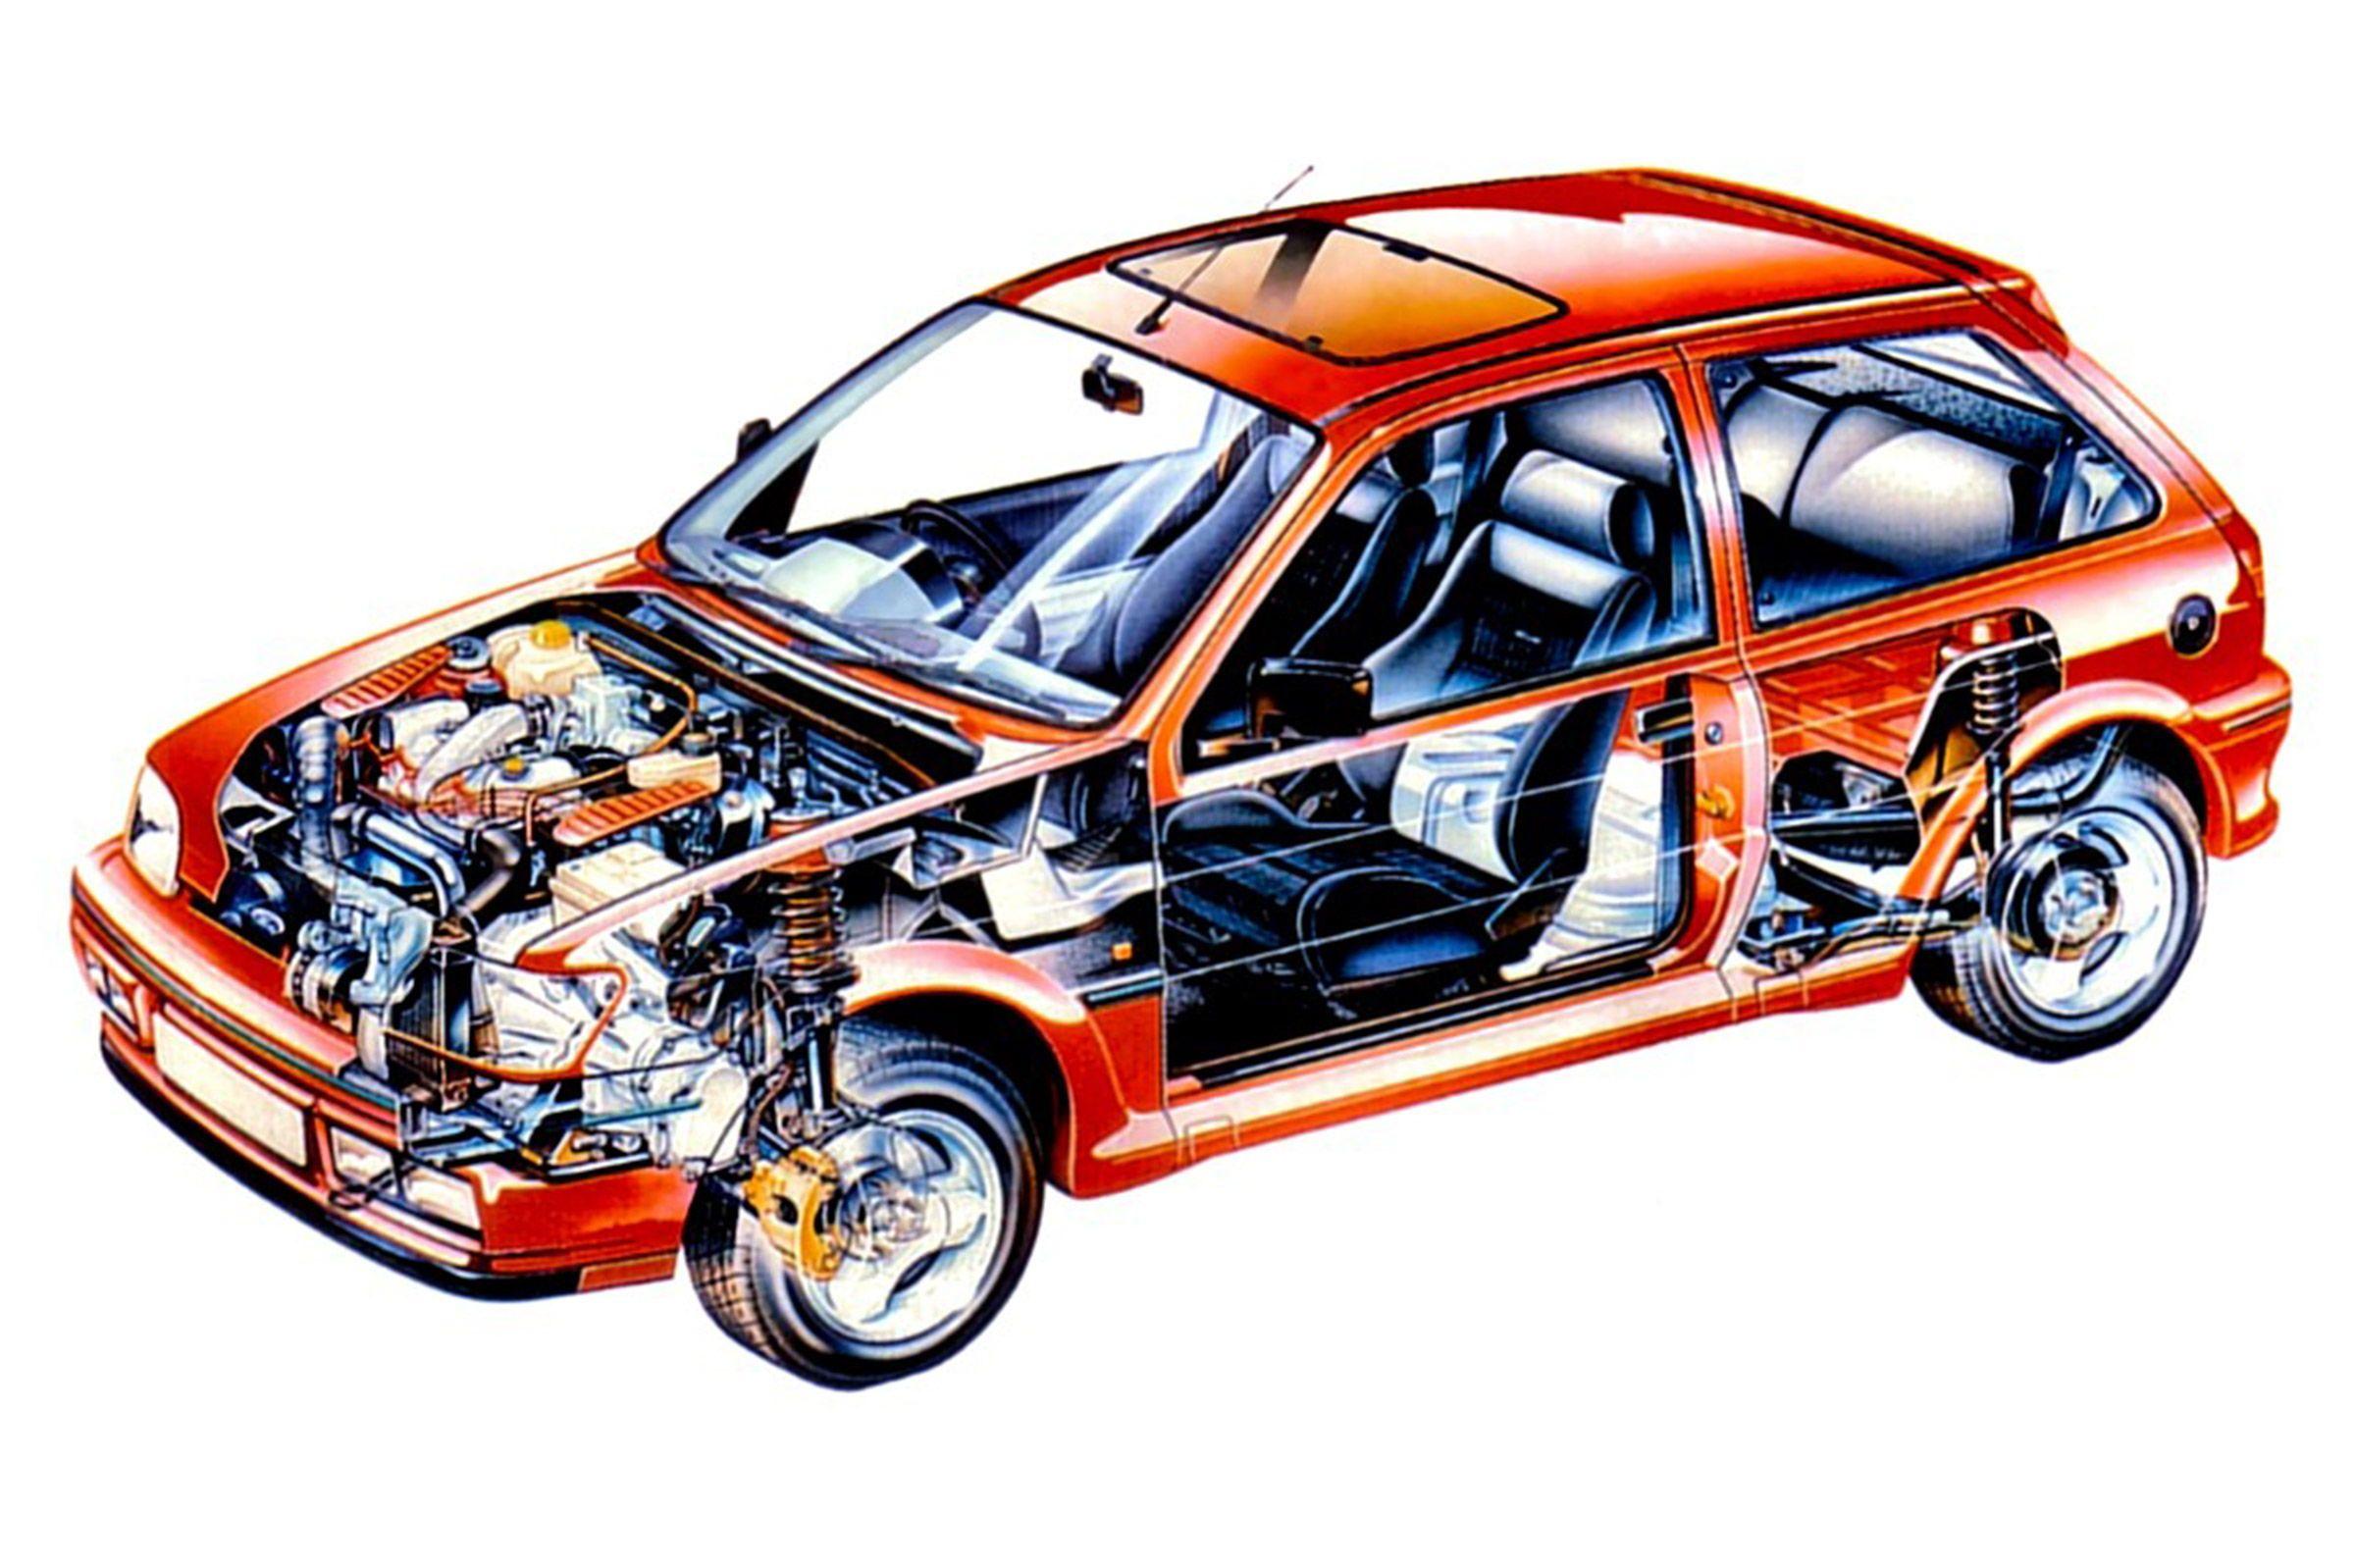 1990 1991 Ford Fiesta Rs Turbo 1 6 Sohc 4 Cylinder Cvh Garrett T2 Turbo Eec Iv Engine Control 133 Hp 134 Torque Ford B5 5 Speed Manual Open Different